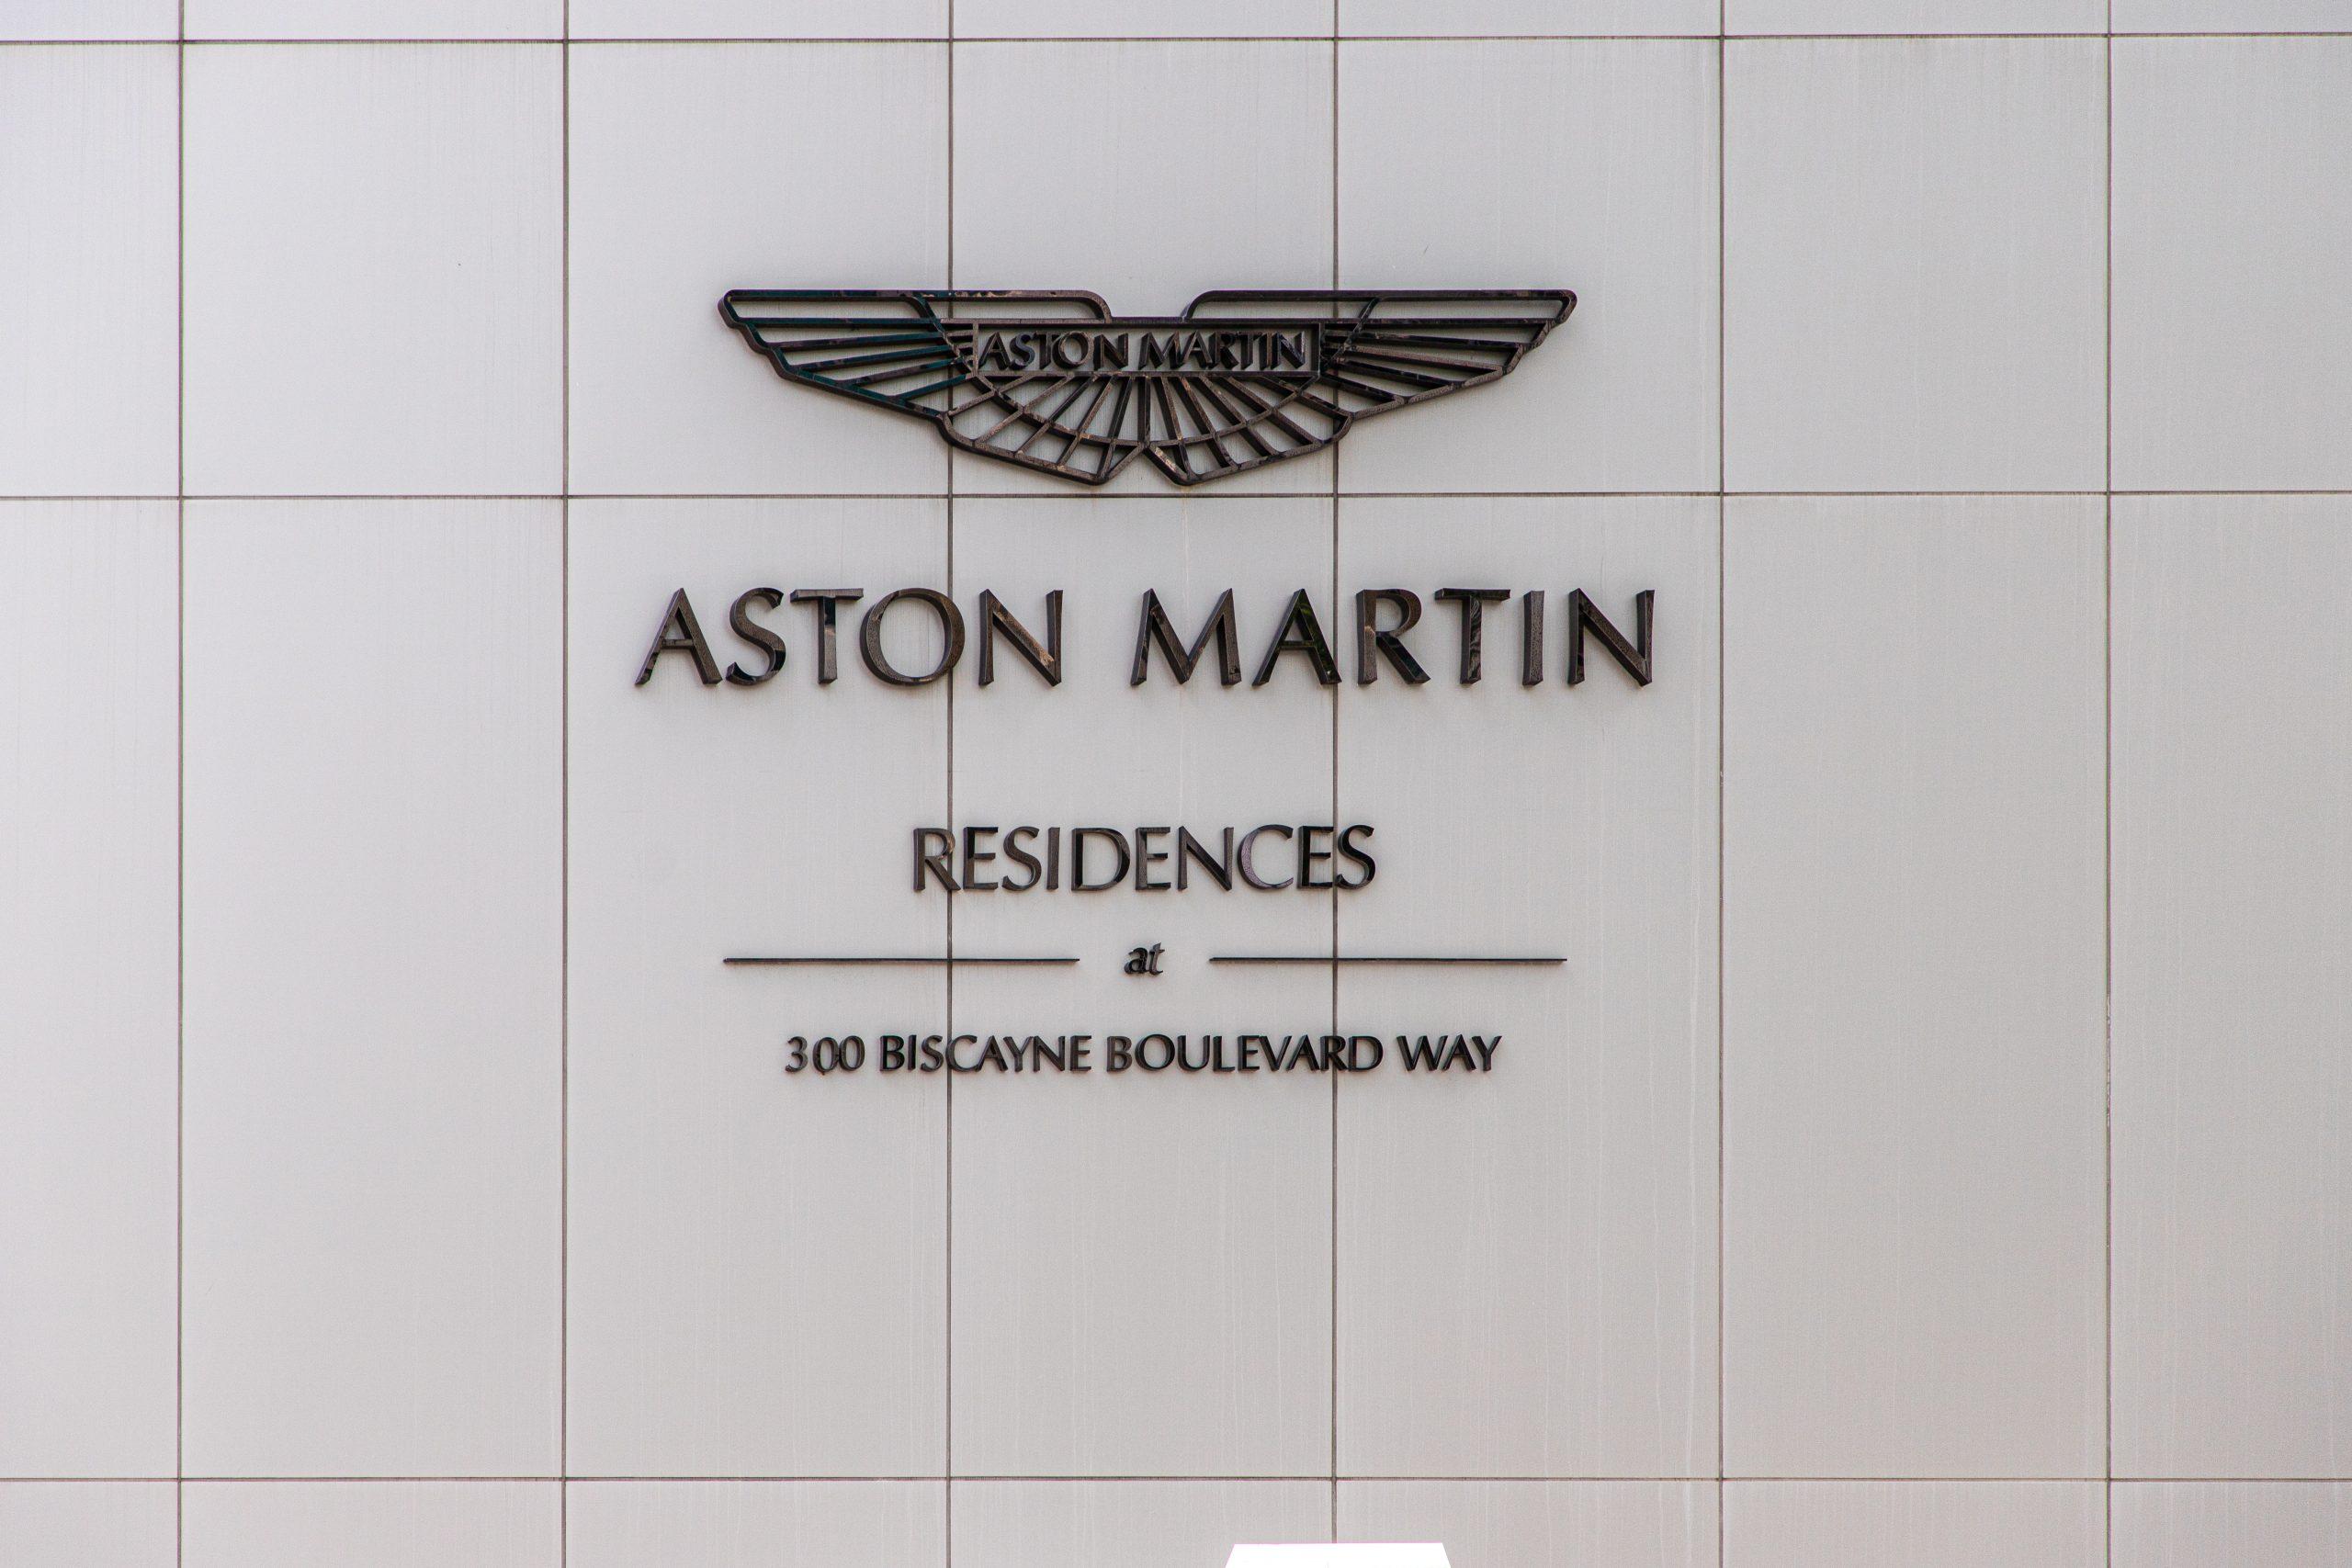 Aston Martin Residences. Photo by Oscar Nunez.